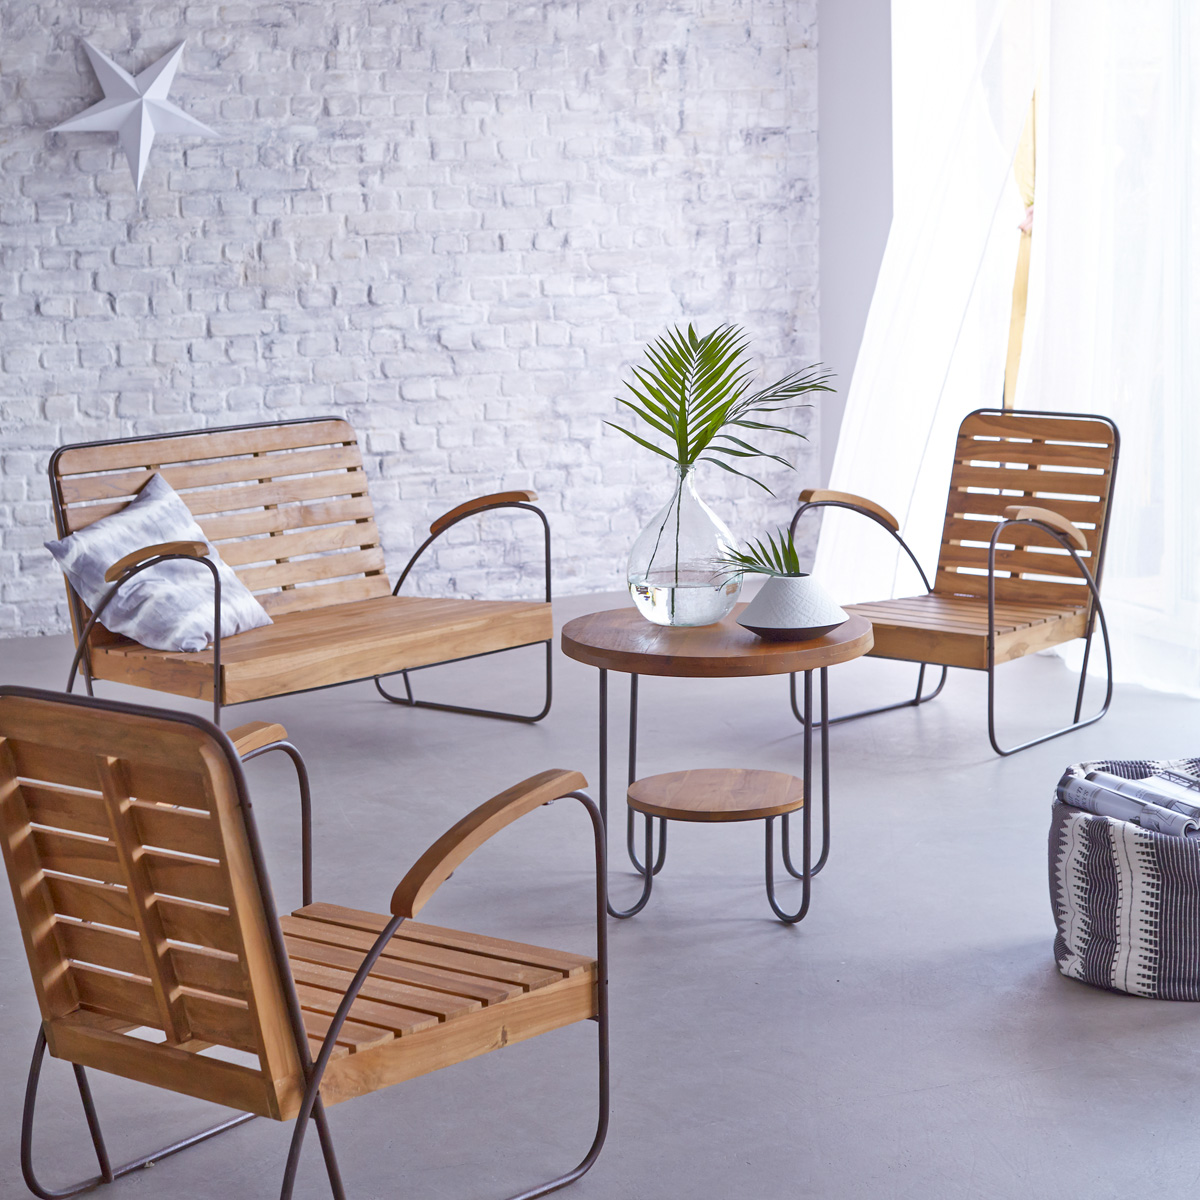 Key Wood solid teak Lounge, seats 4